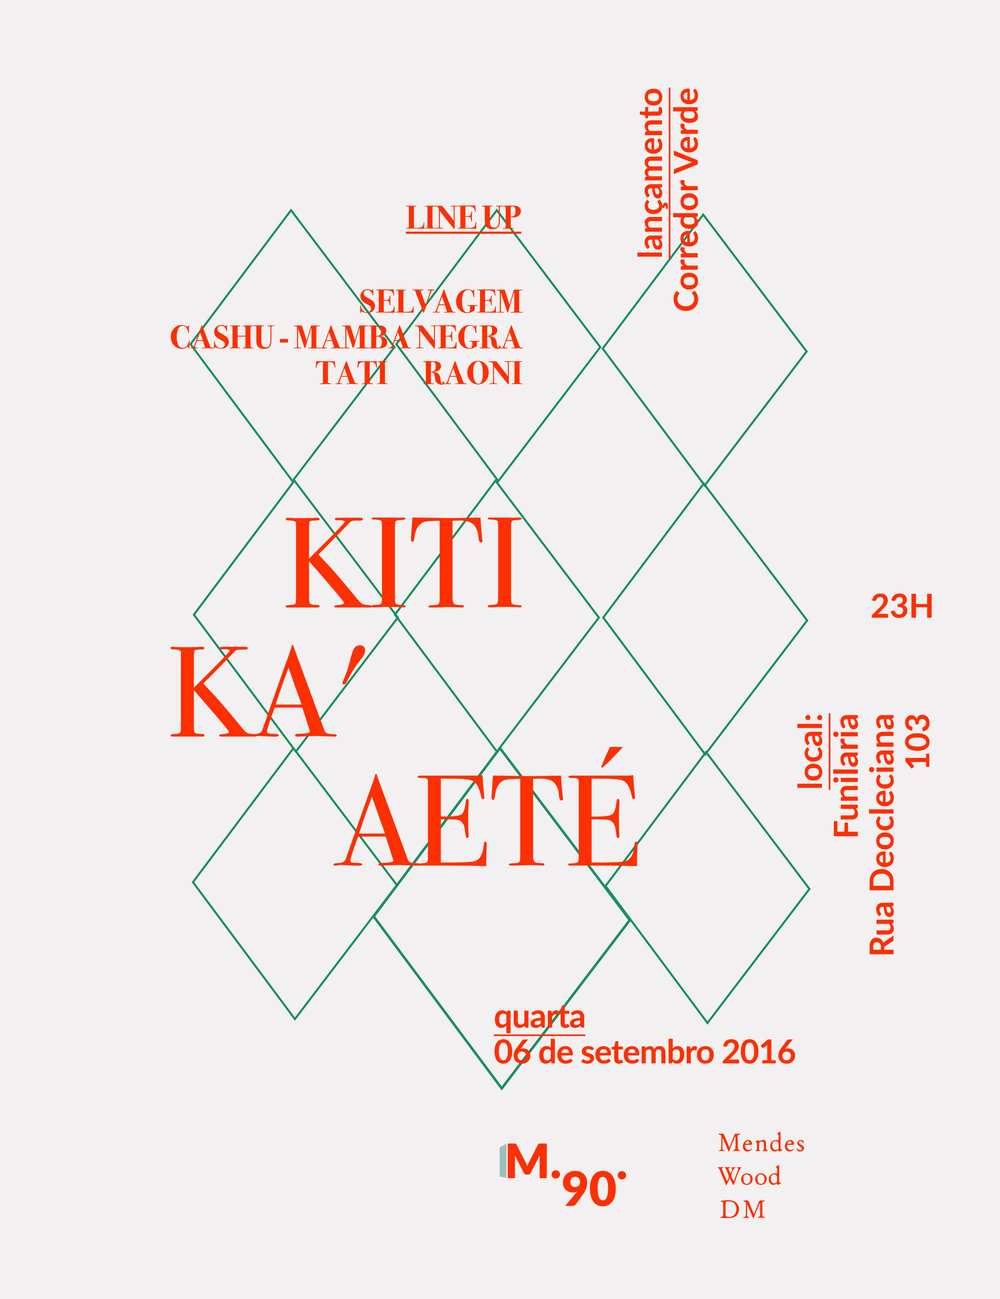 KITI KA AETE 2-13.jpg